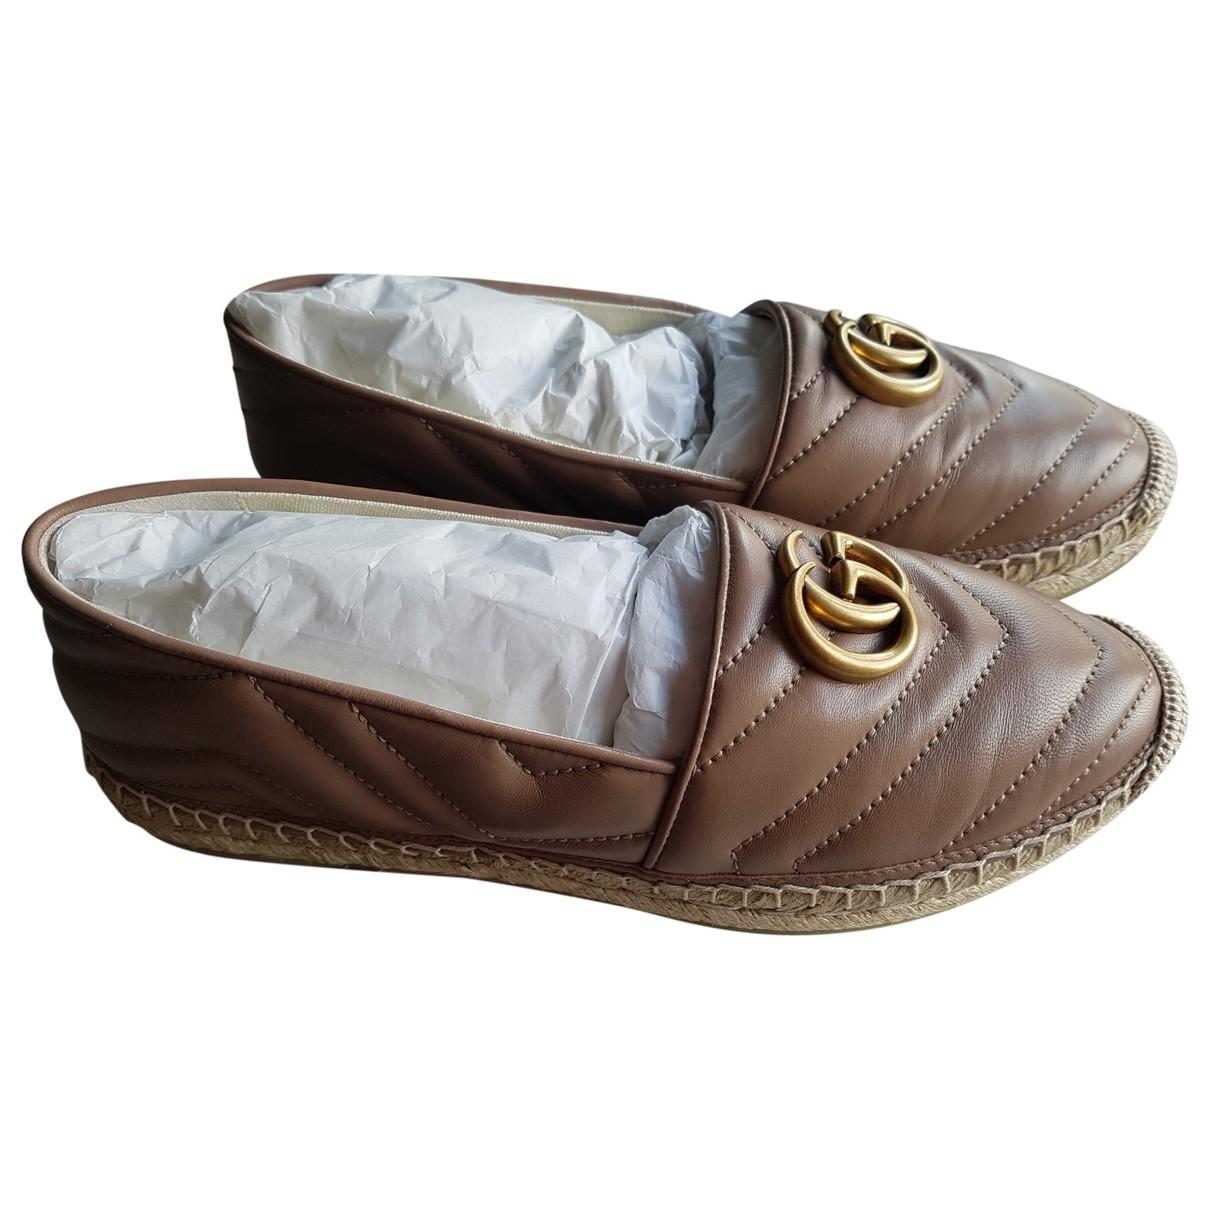 Gucci Lilibeth Beige Leather Espadrilles for Women 39 EU